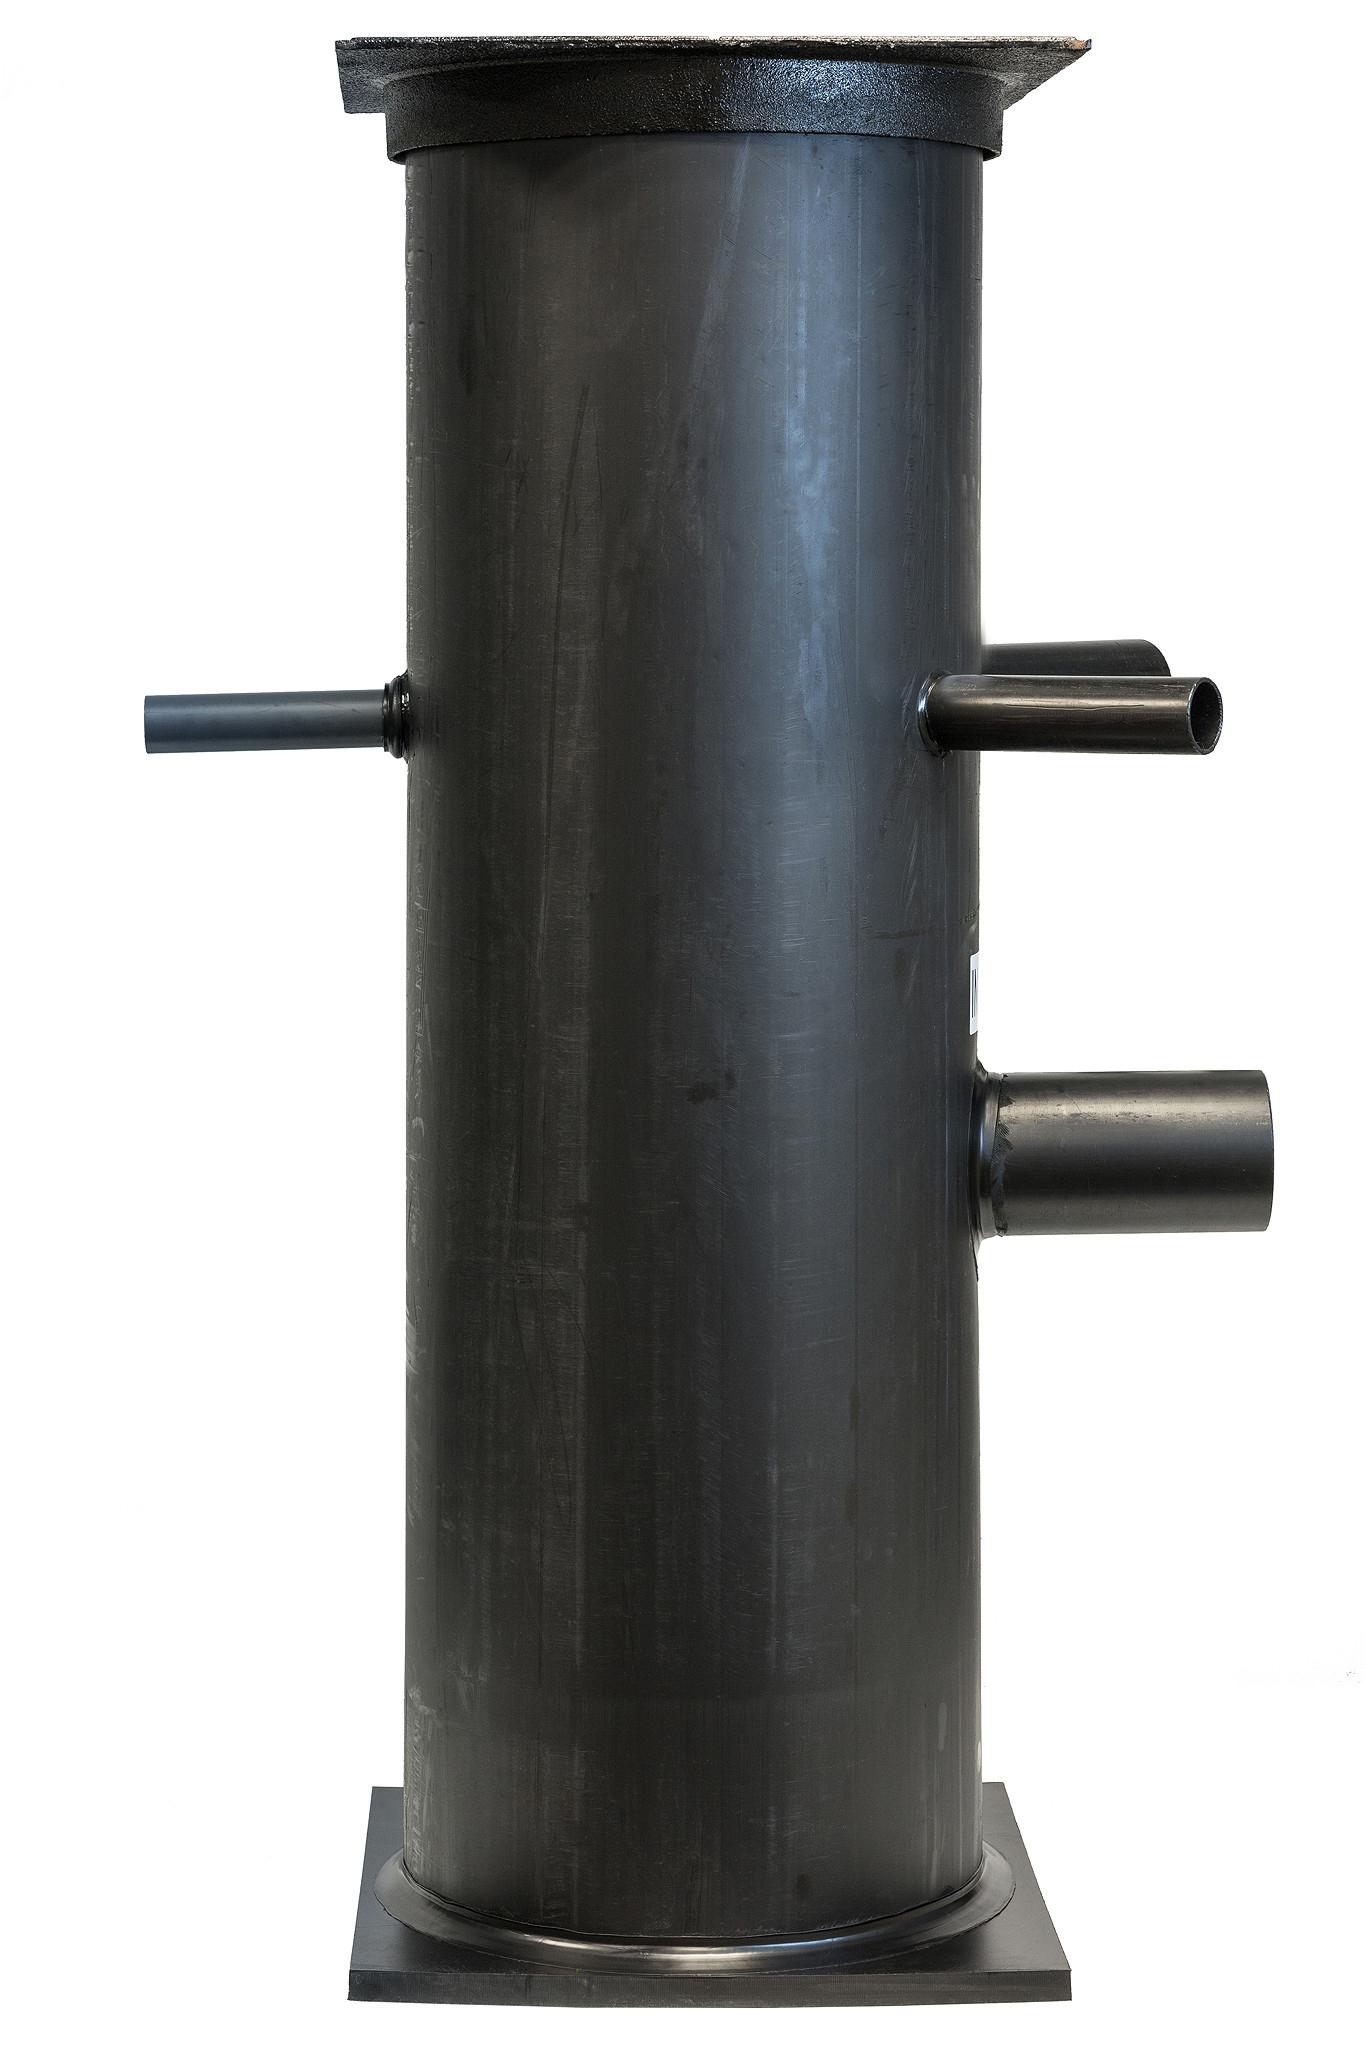 HDPE 612/1200 Prestige - 350 Liter